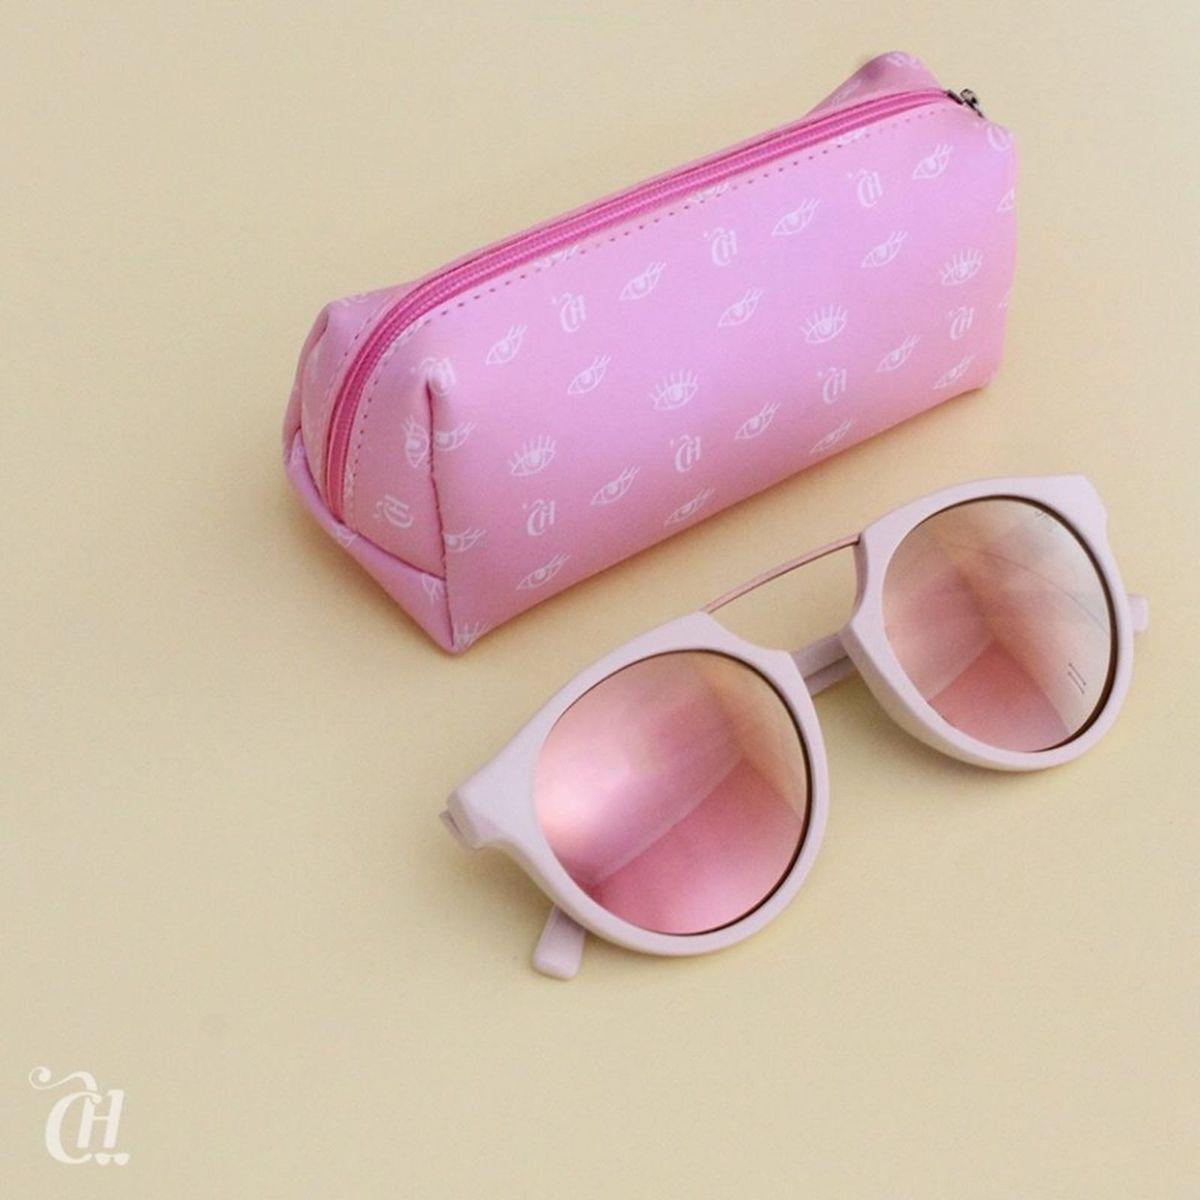 e9d91f9157428 óculos de sol capricho - óculos capricho.  Czm6ly9wag90b3muzw5qb2vplmnvbs5ici9wcm9kdwn0cy8xmzazmzmvnwnlztc1owjhzgy0ntqxntmwnjkzzwjlm2m1njrmn2iuanbn  ...